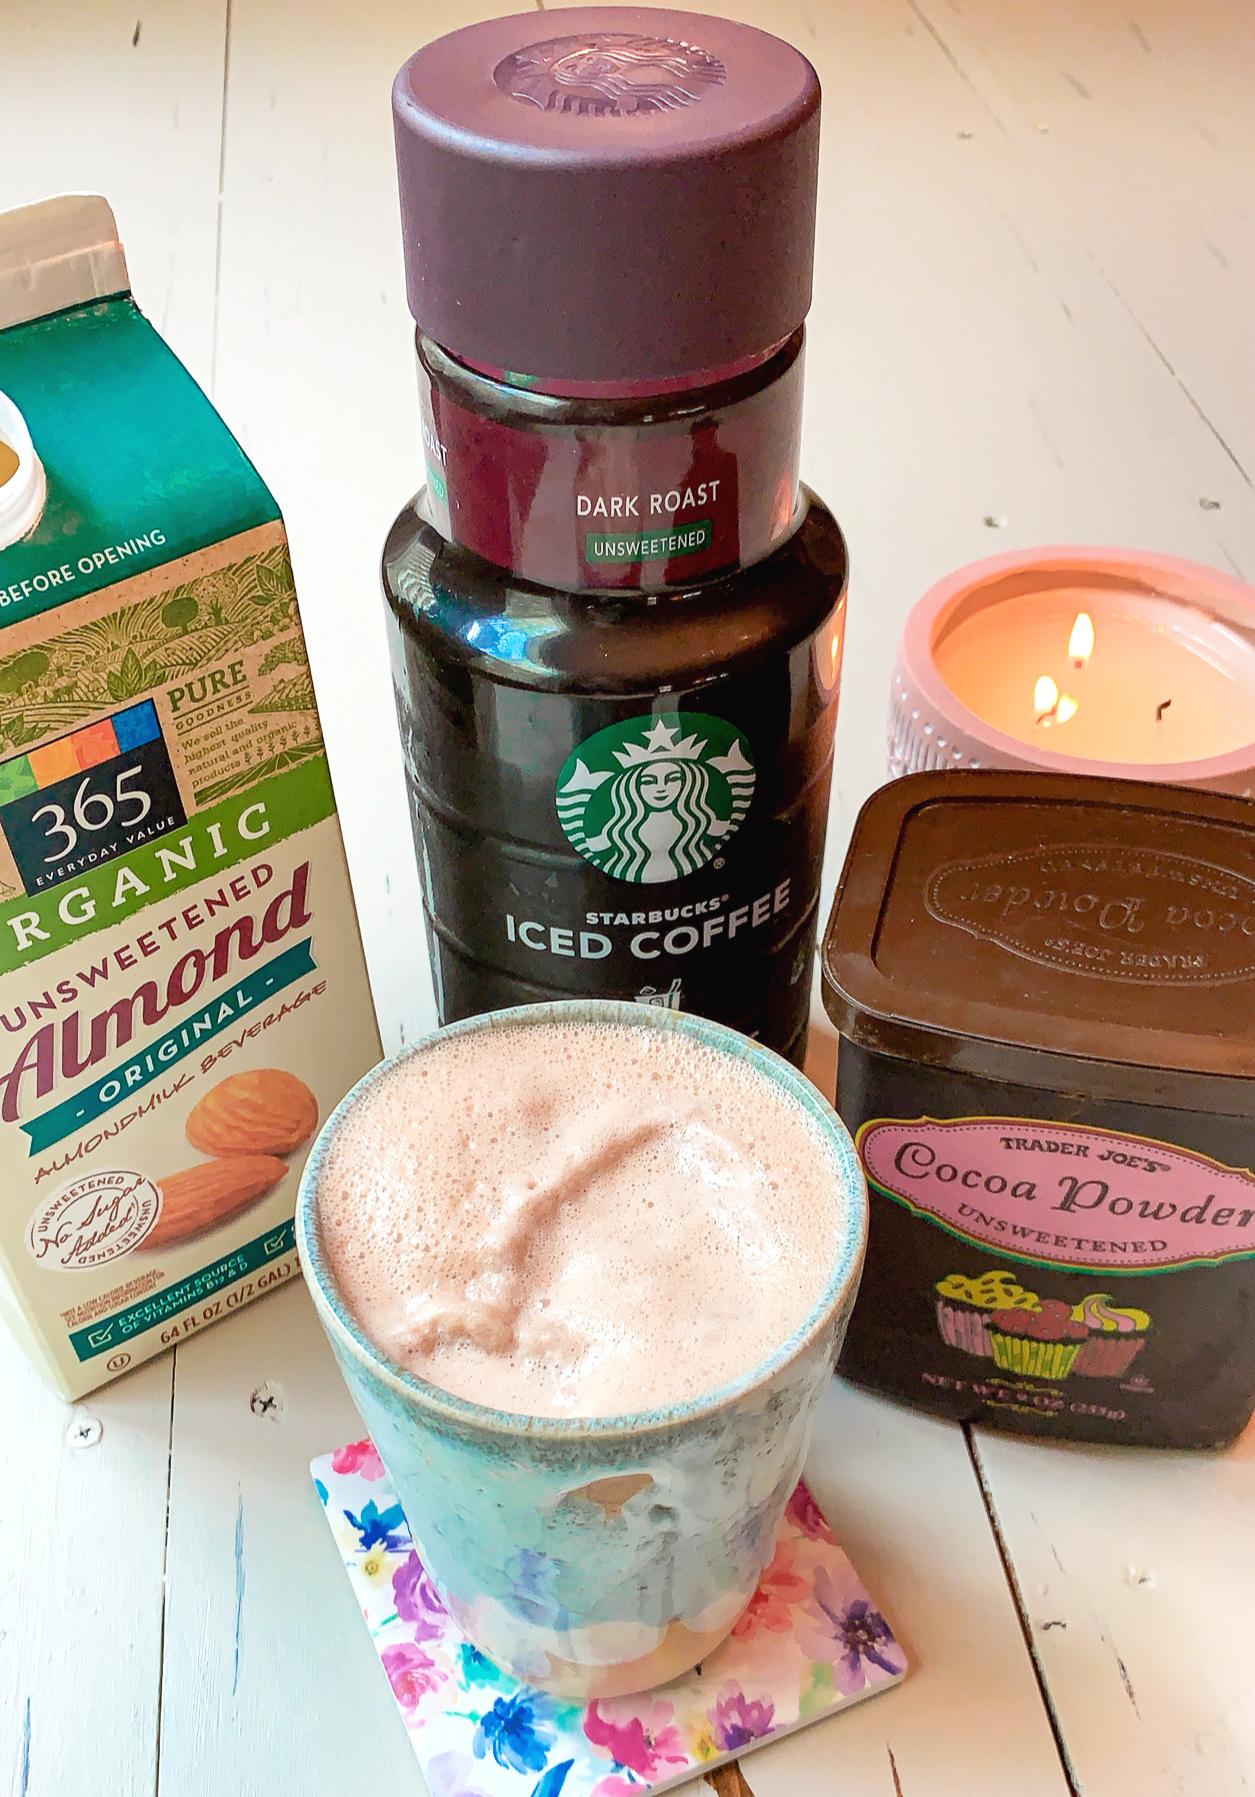 healthy Starbucks, healthy food, diet, almond milk, vegan, gluten free, coffee, iced late, sugar free, blended, healthy Starbucks, mocha, latte, fall drinks, recipe